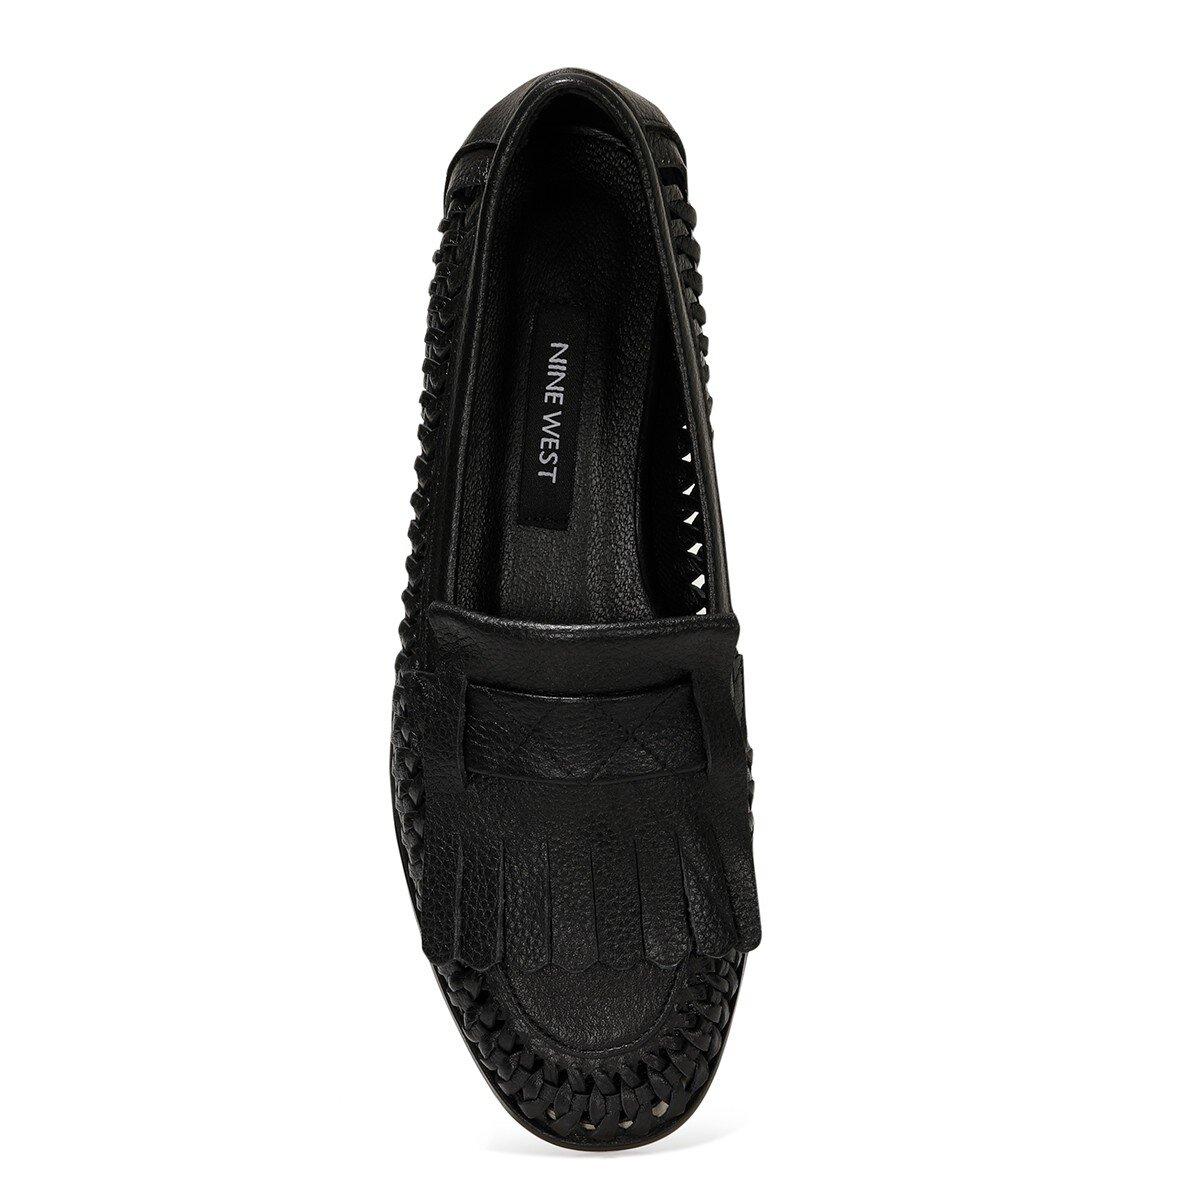 FAINRA 1FX Siyah Kadın Loafer